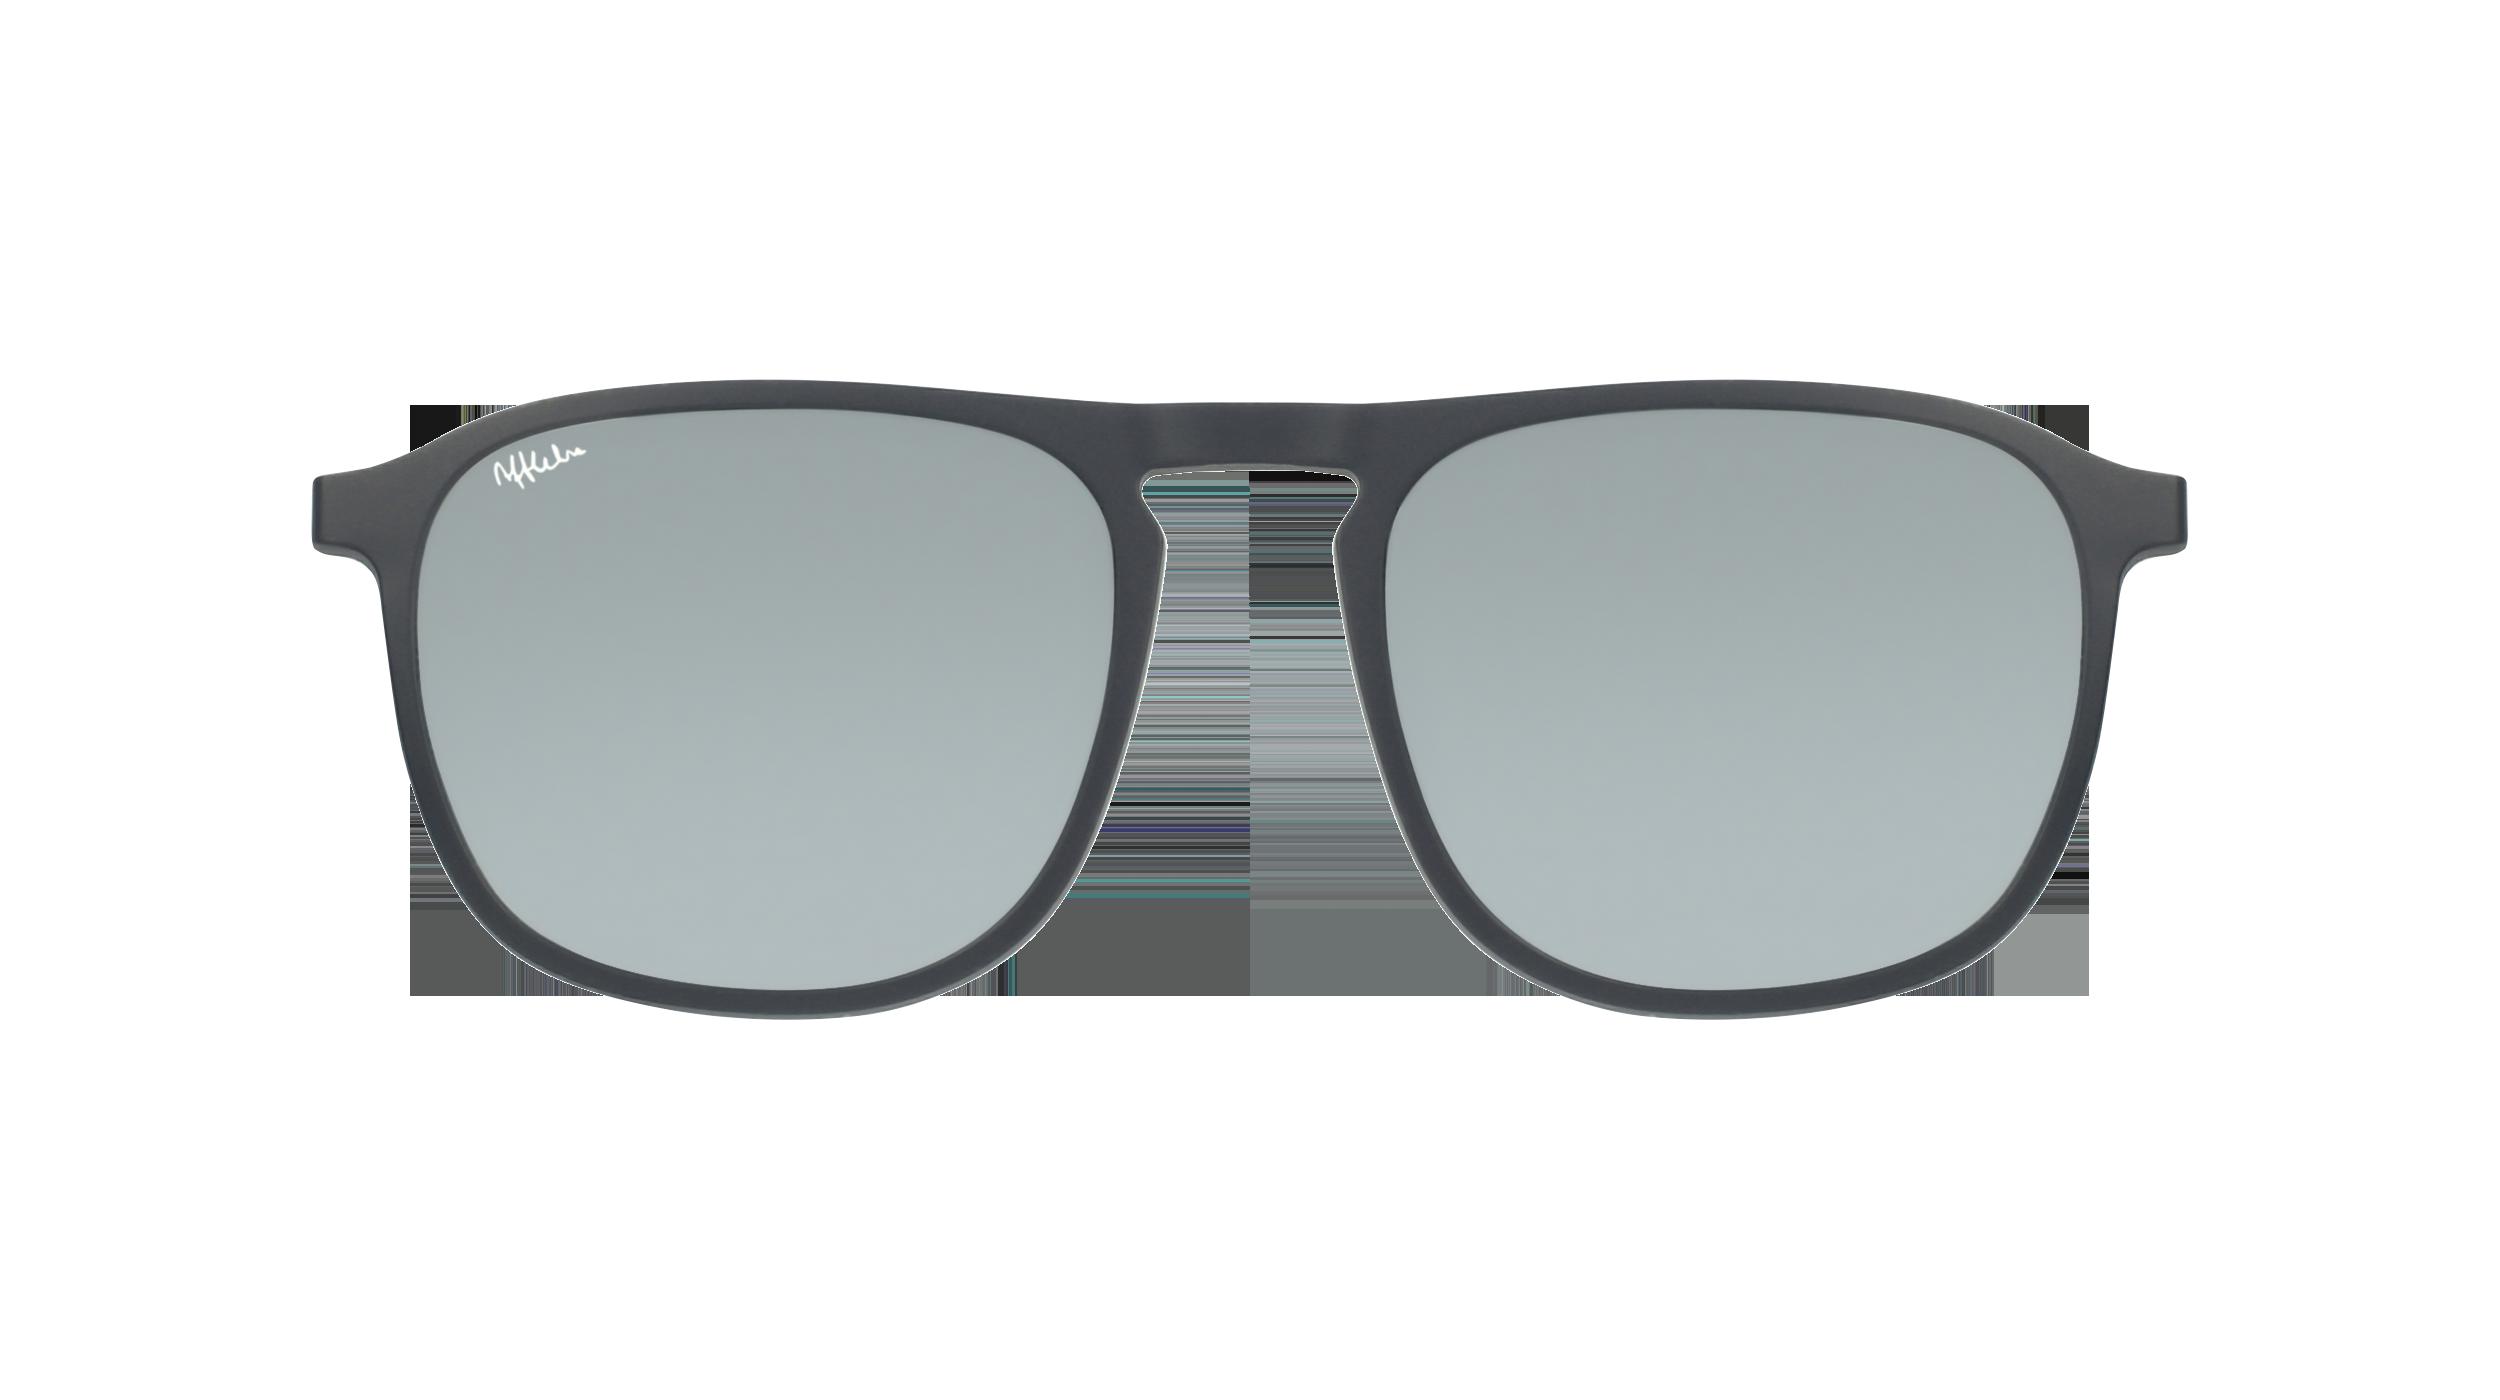 afflelou/france/products/smart_clip/clips_glasses/07630036457221.png